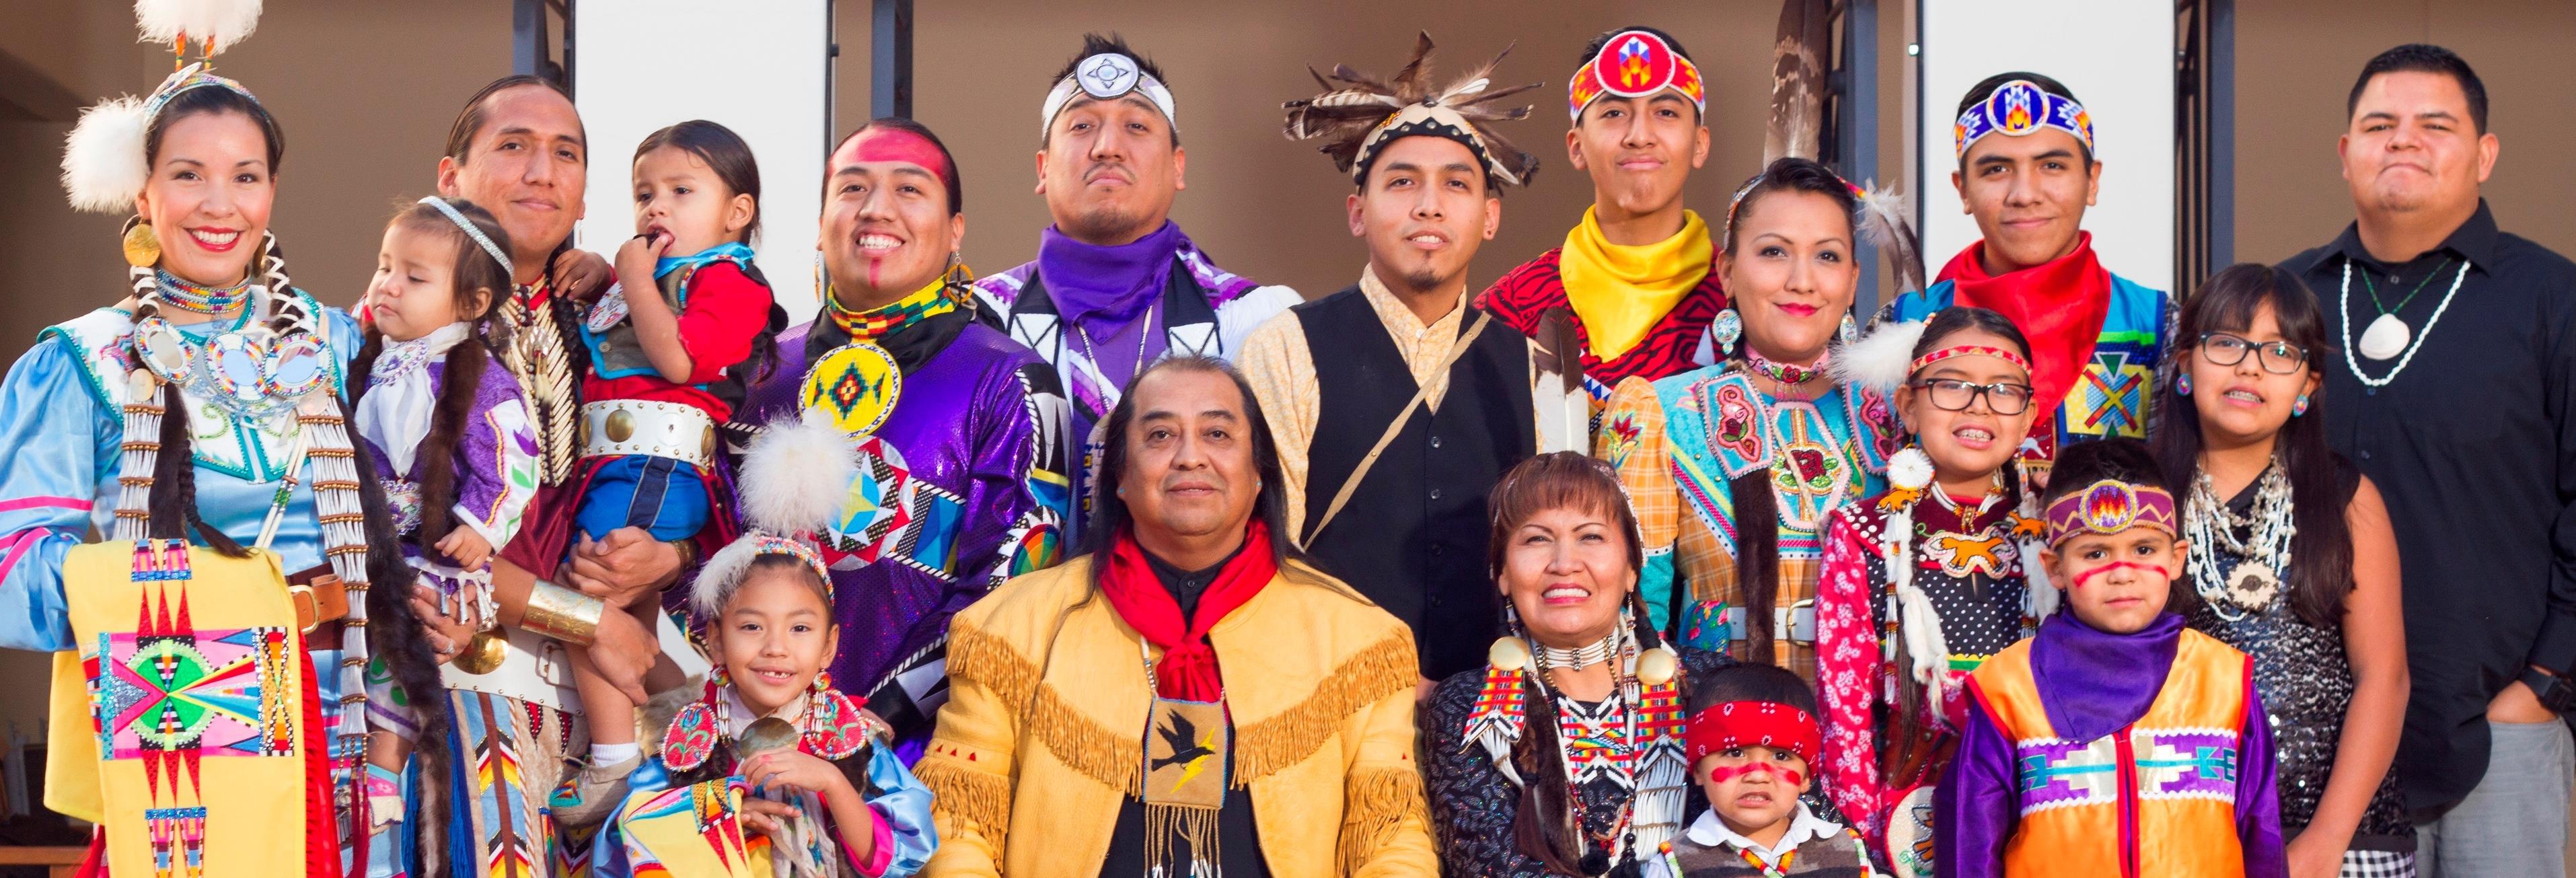 Native American Entertainnment Hoop Dancers Dance Group